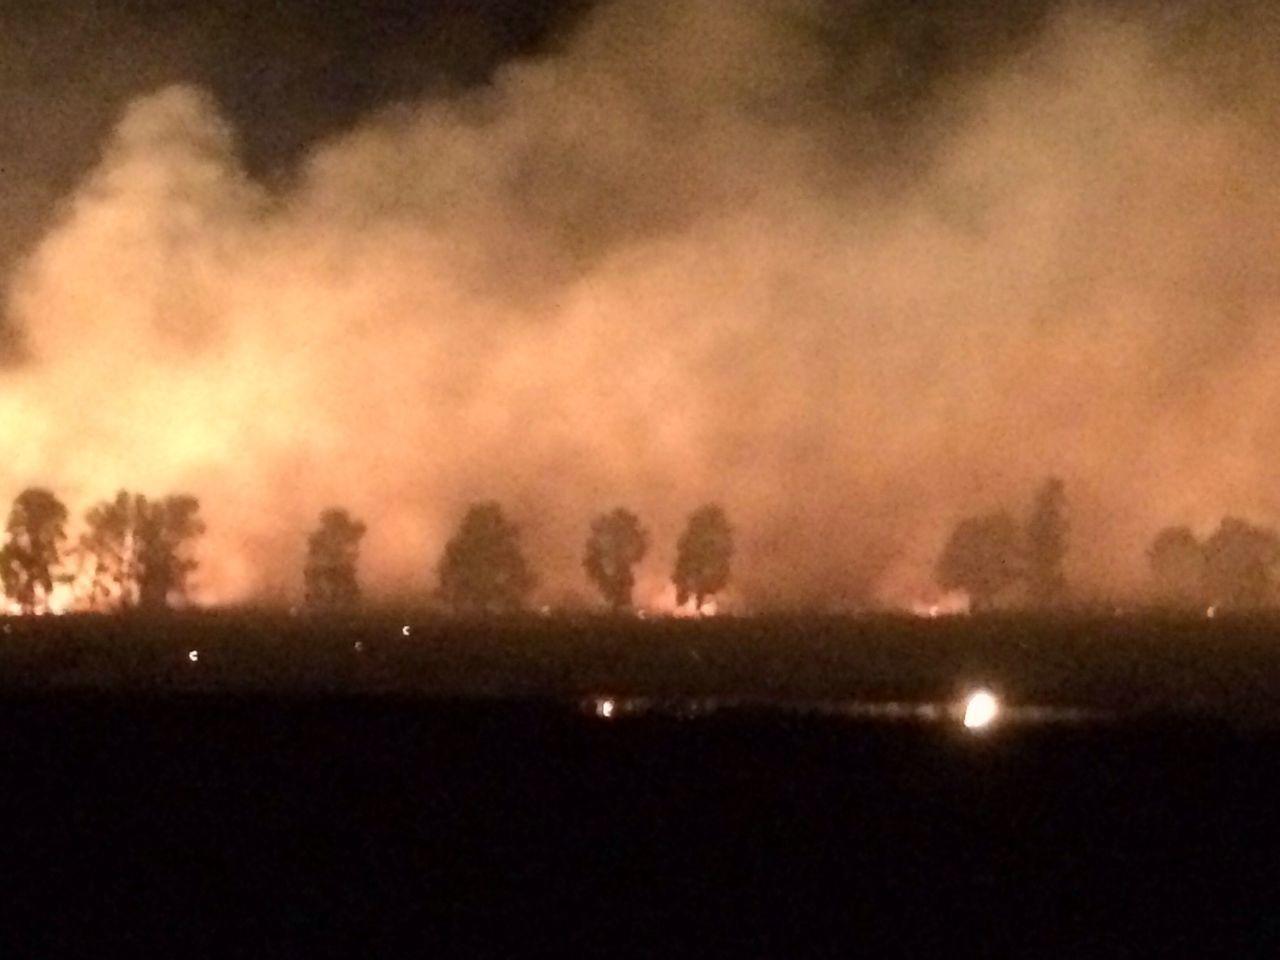 Controlled burn near Walbundie Nsw just after dusk